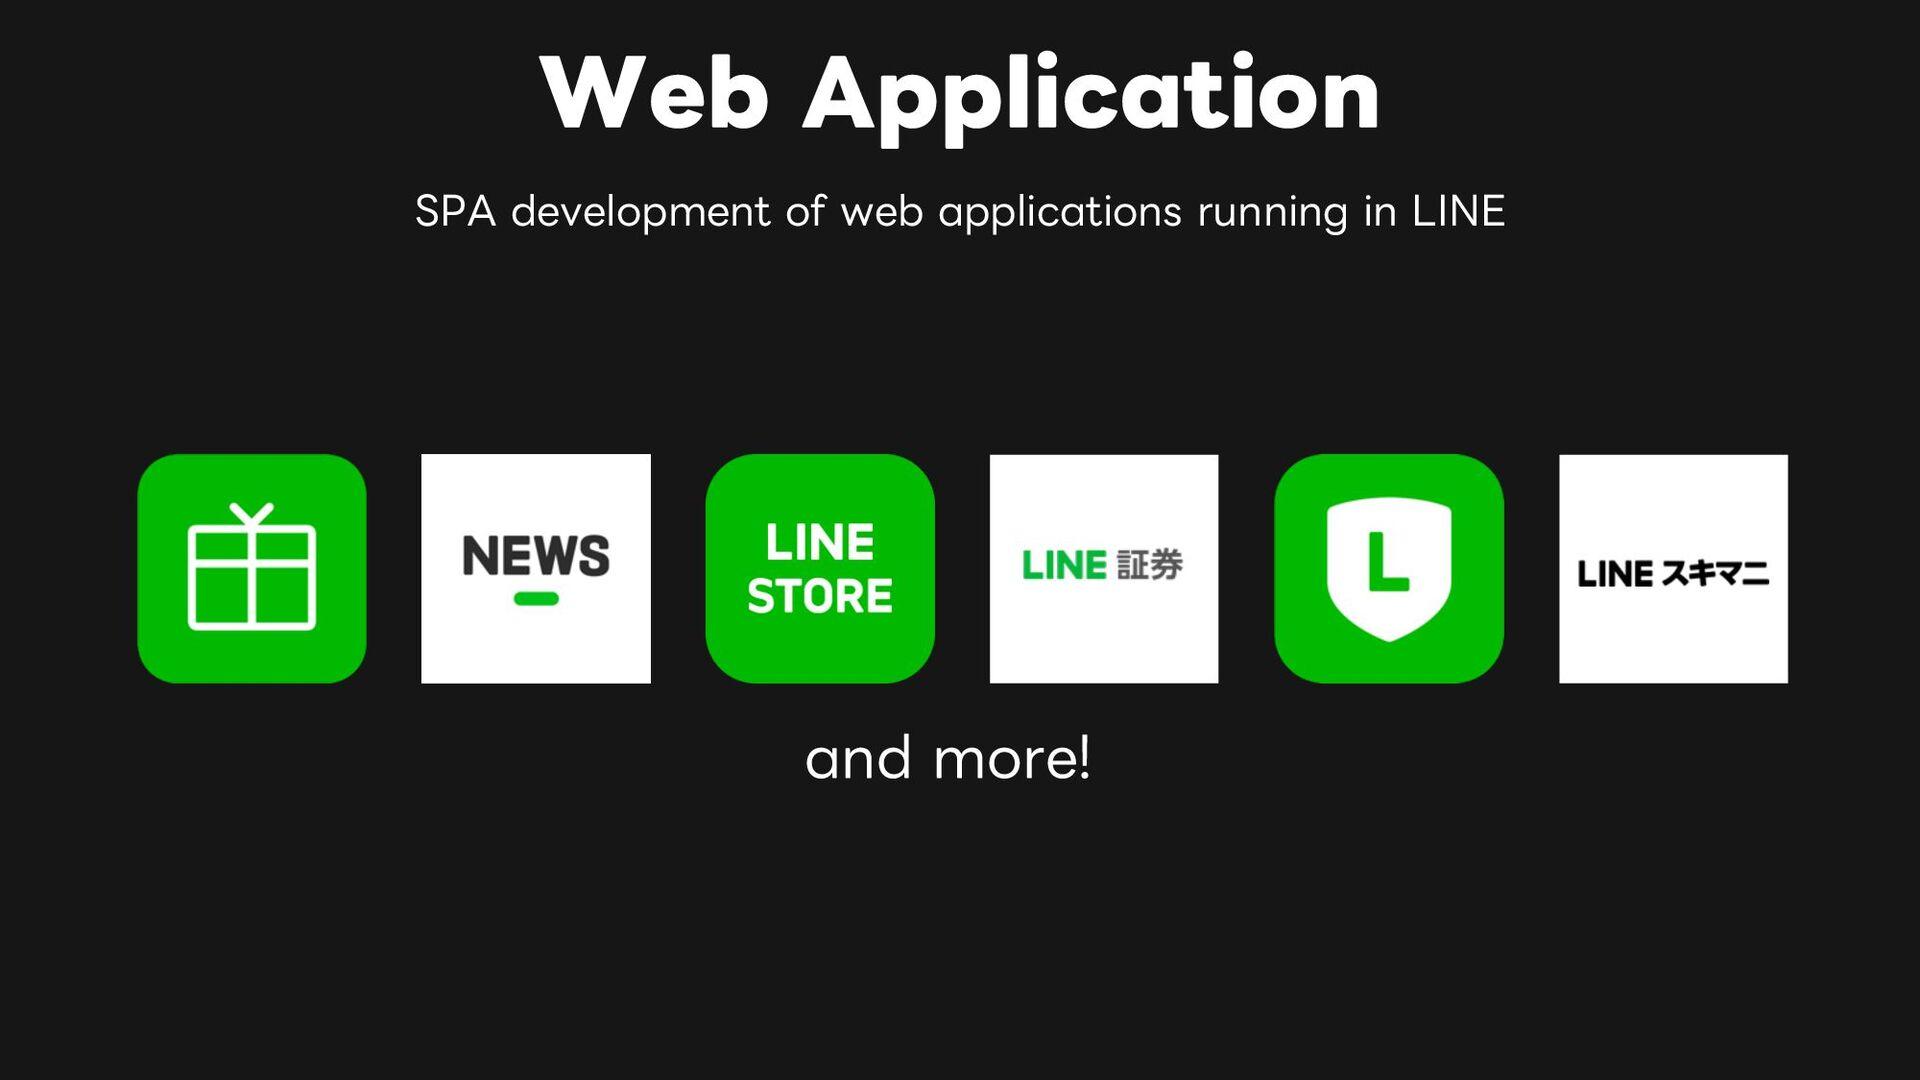 Web Application © LINE 7 -*/&ͷதͰىಈ͢Δ8FCΞϓϦέʔγϣϯ...